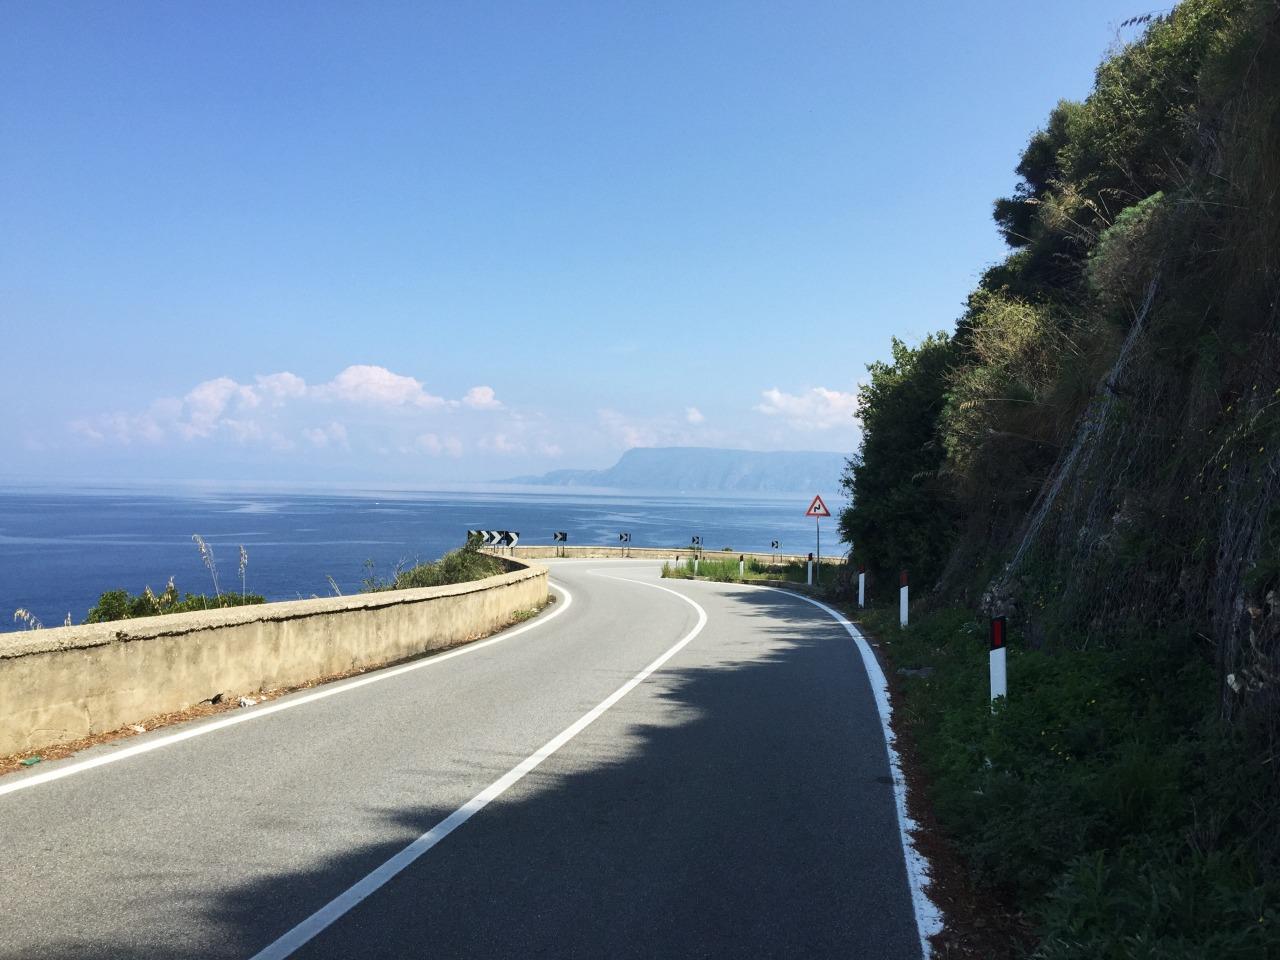 Day 9: Messina - San Ferdinando